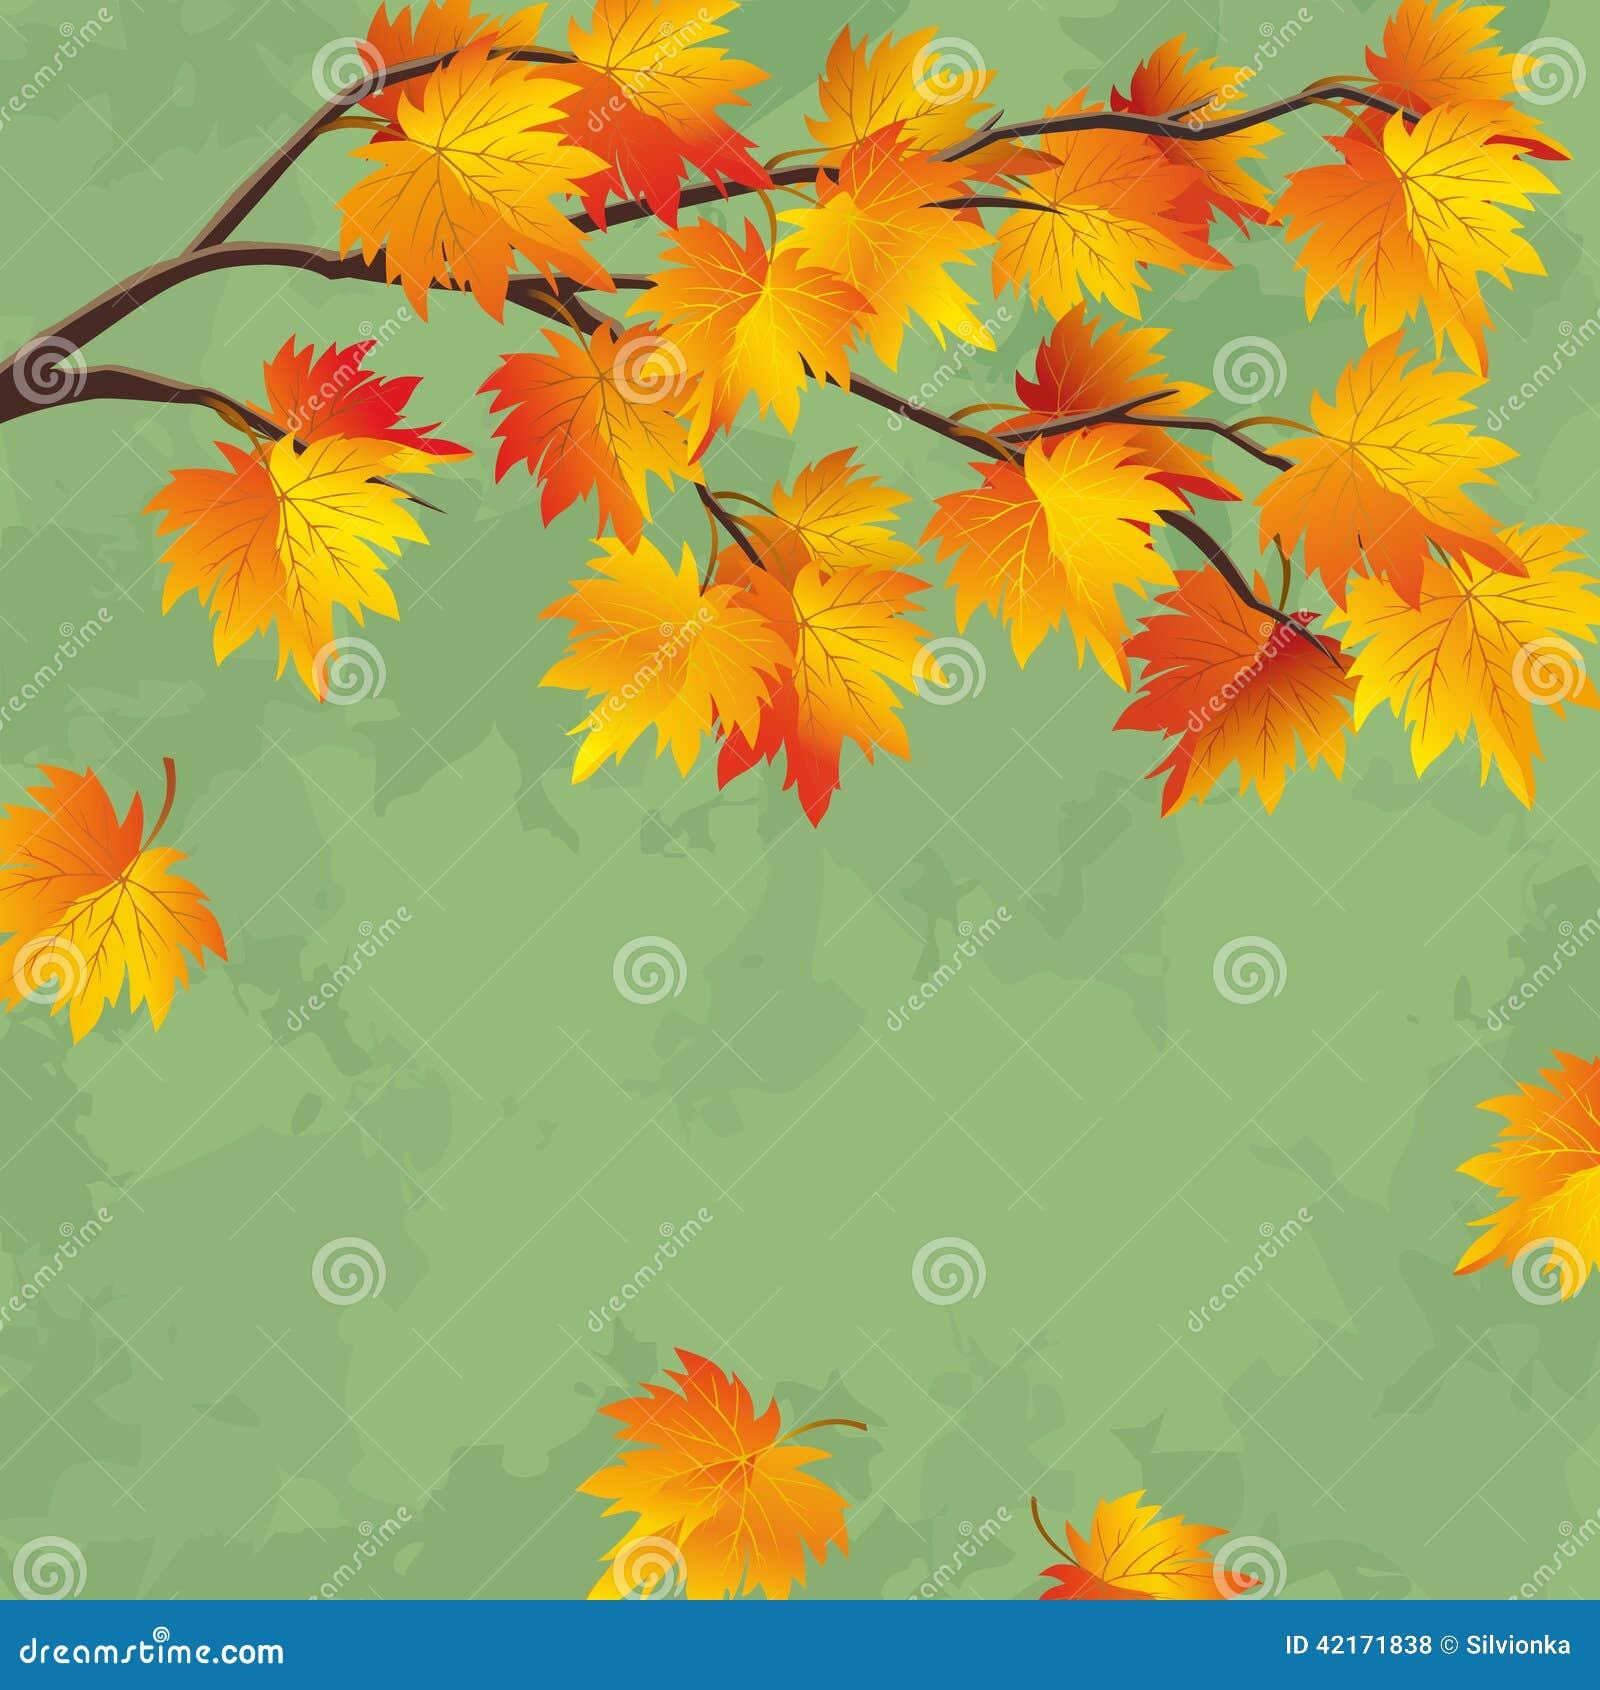 Vintage Autumn Wallpaper, Leaf Fall Background Stock ...